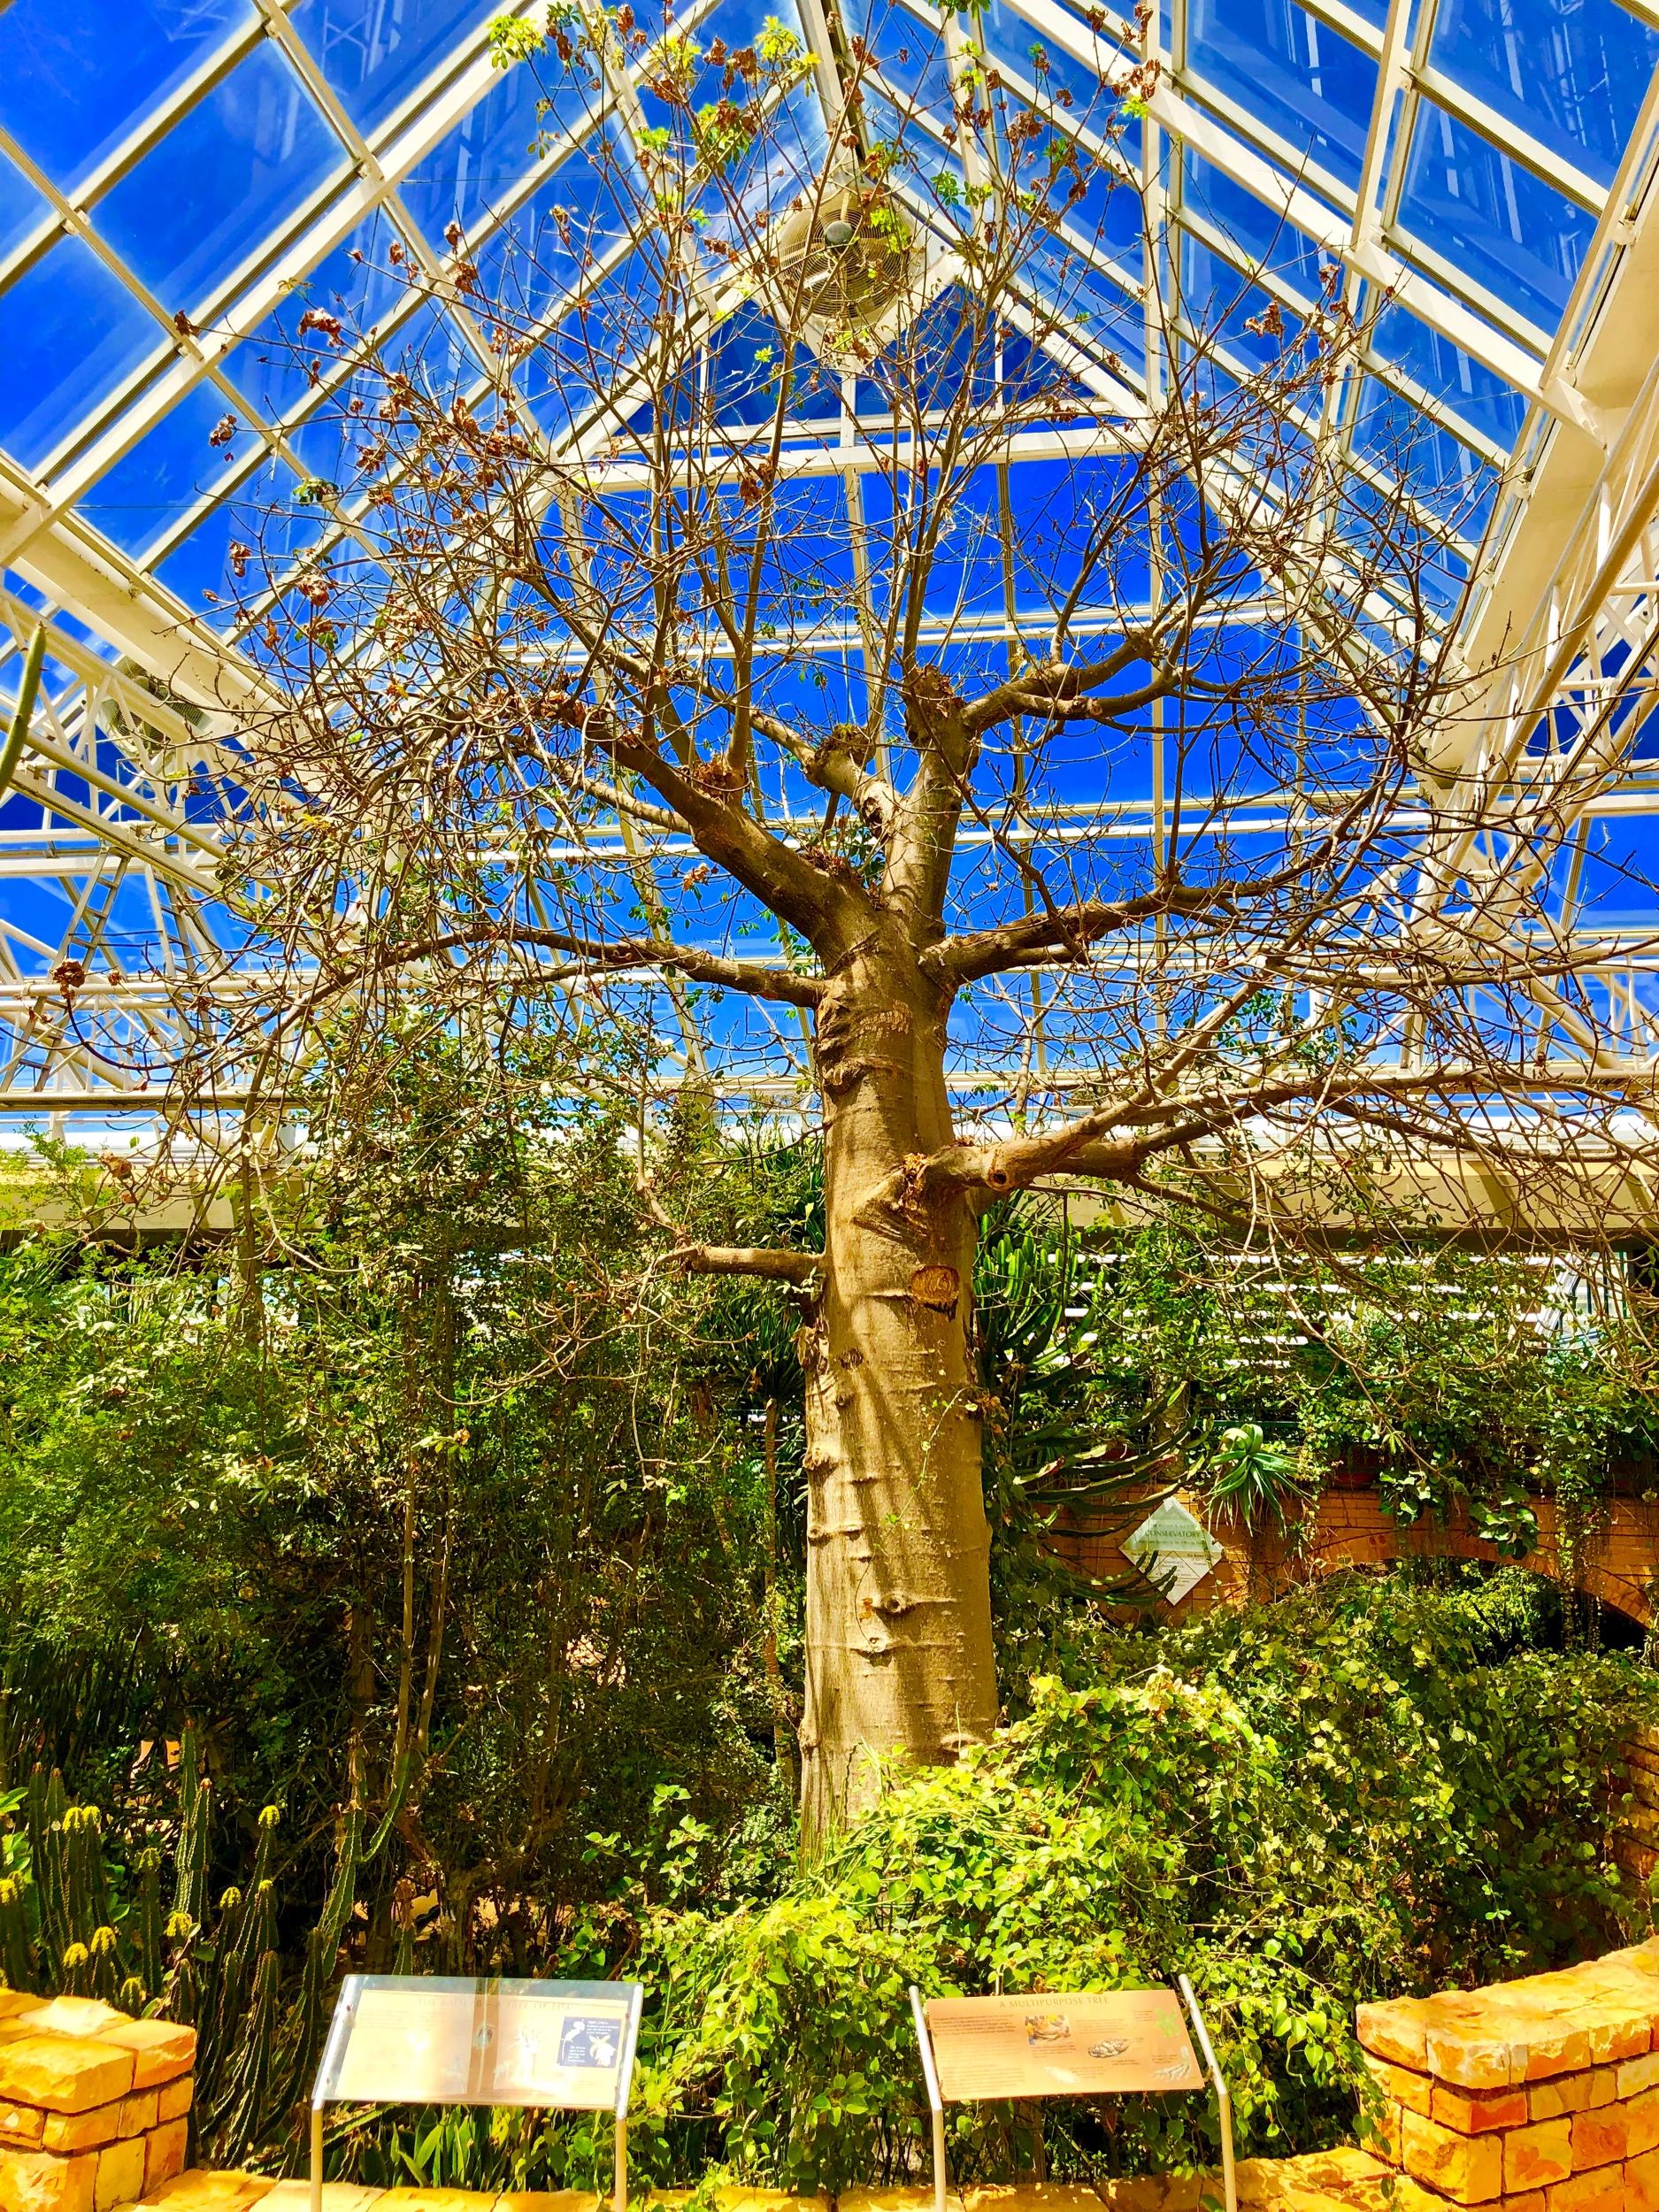 Baobab tree in Kirstenbosch Botanical Gardens